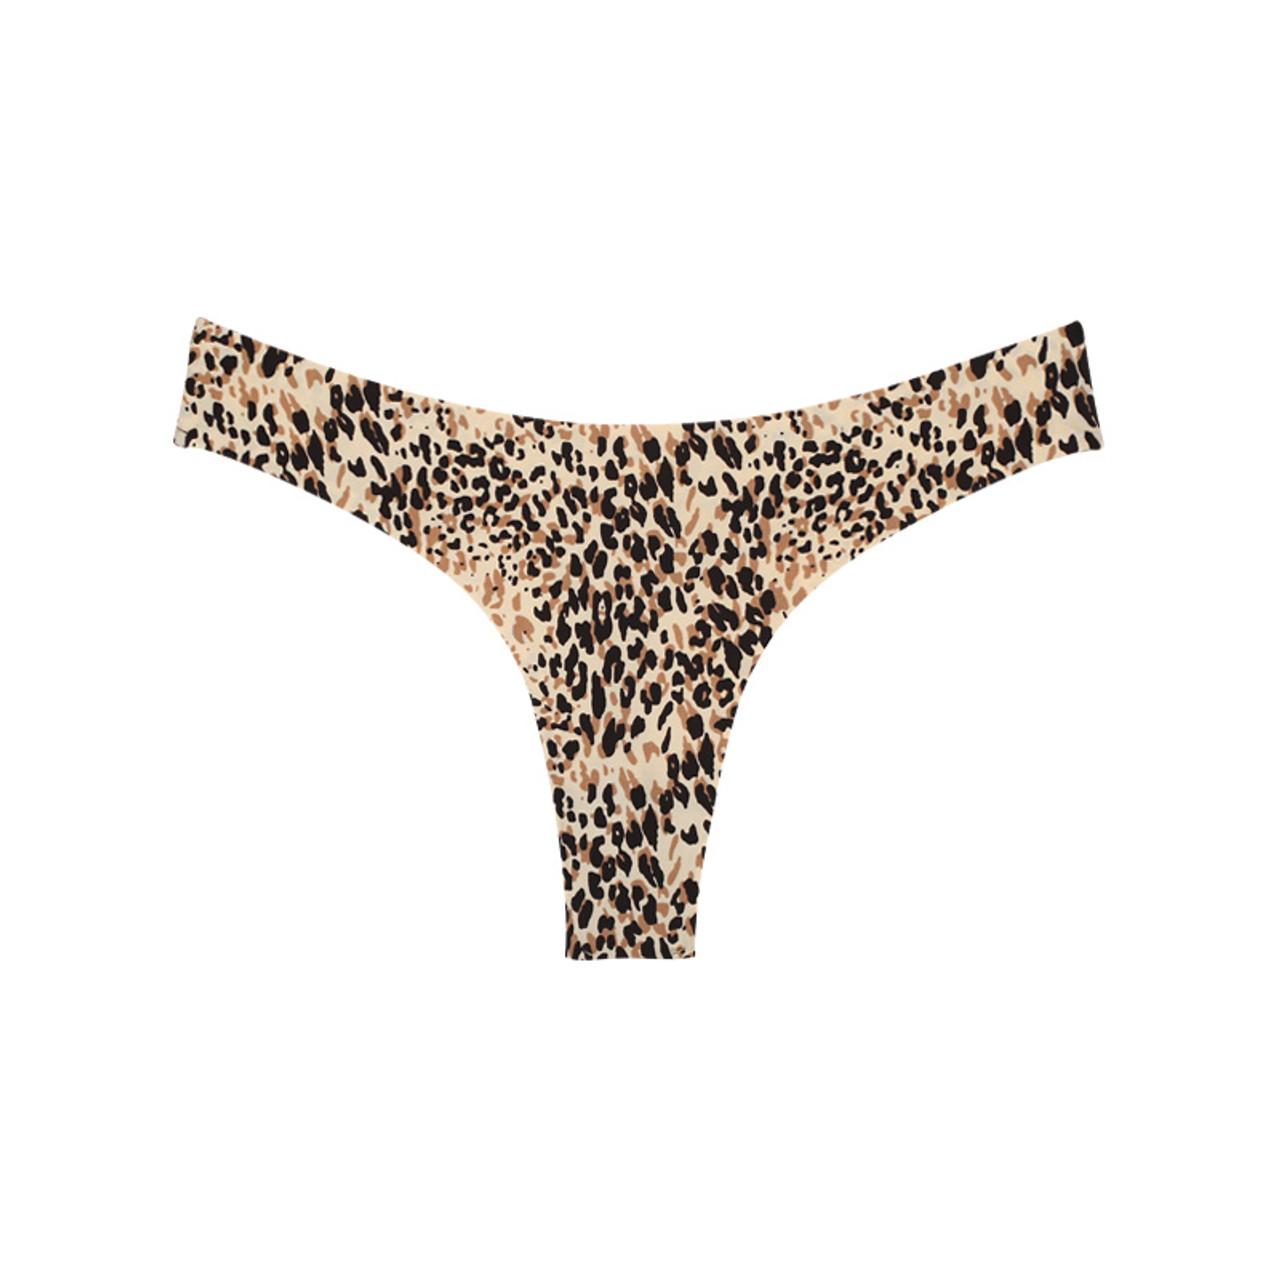 4eeb23f180f7 ... Wealurre seamless panties women's thong underwear cotton g string sexy  bragas tanga mujer ladies Ultra- ...